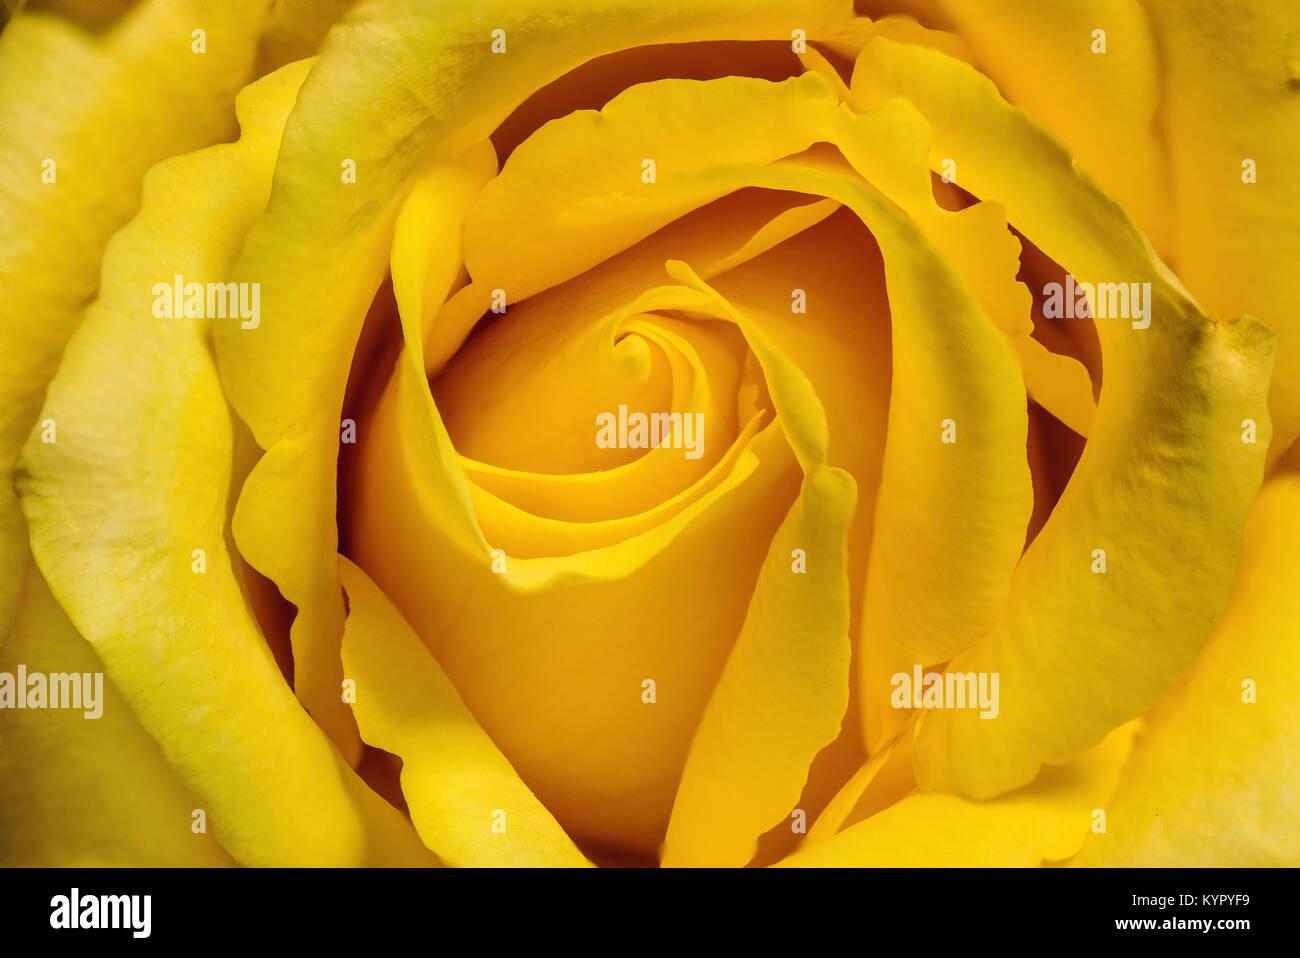 Soft Focus Yellow Rose Flower Stock Photos Soft Focus Yellow Rose